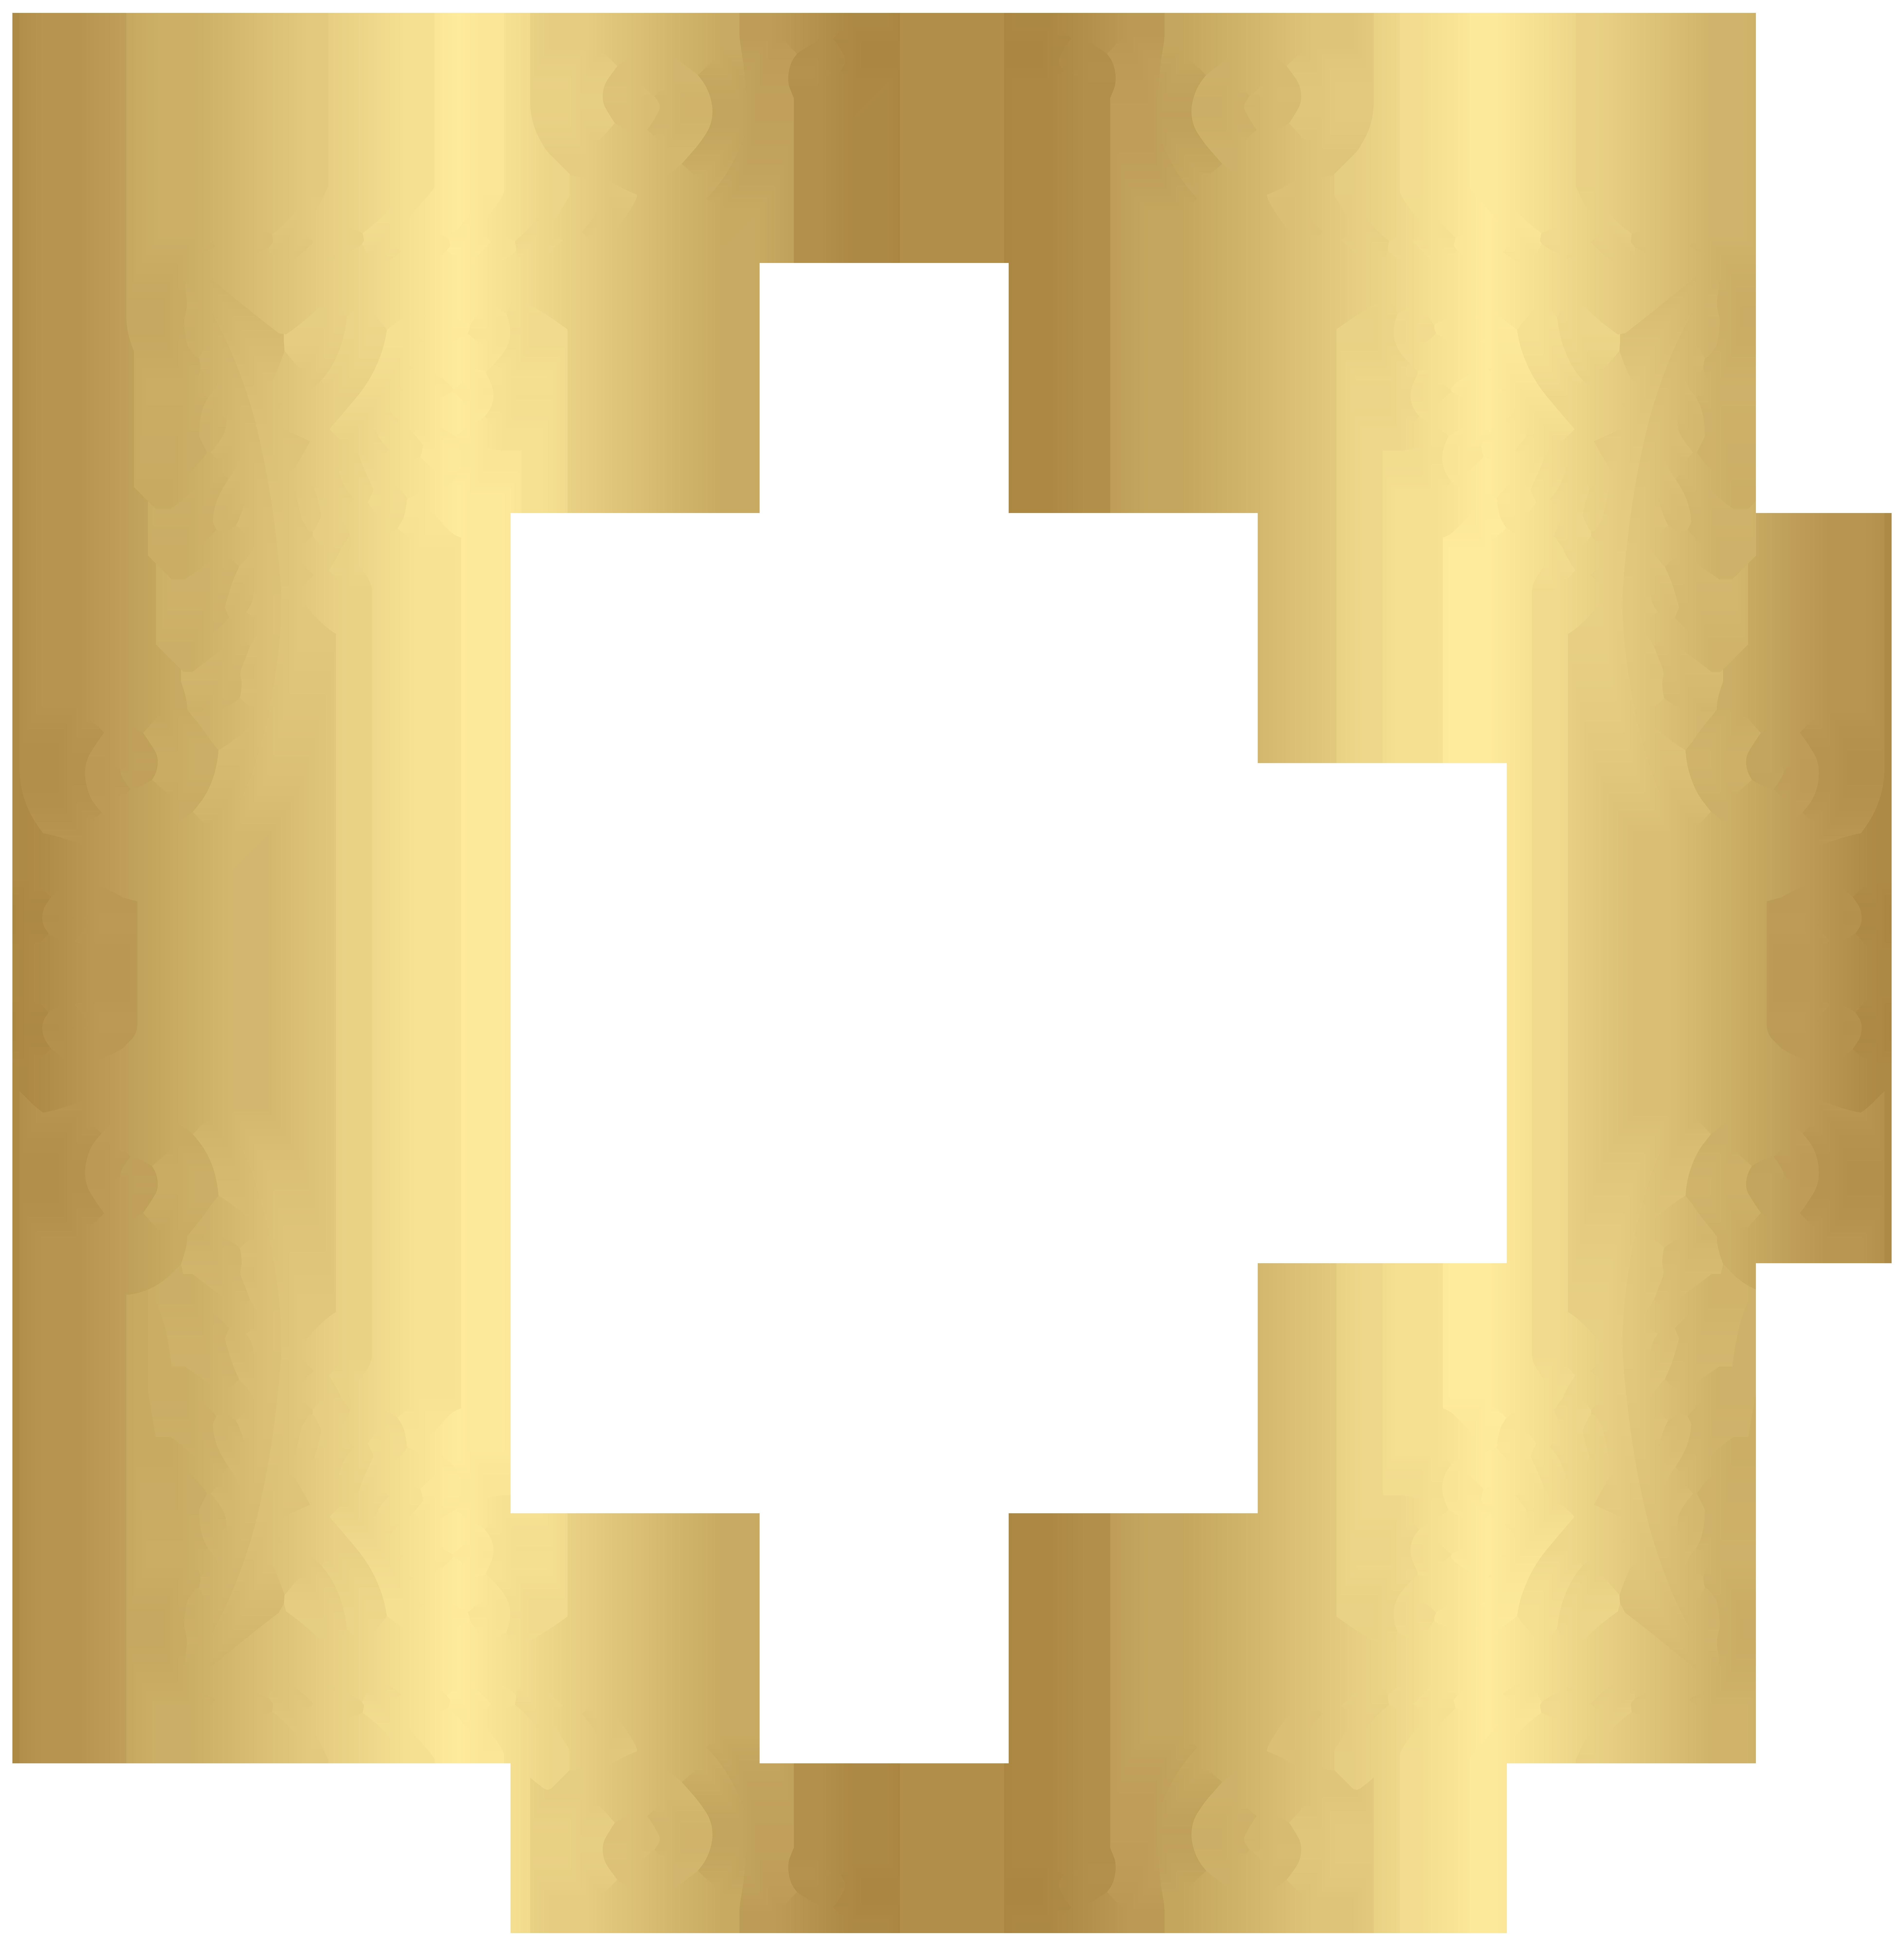 White frame gold trim clipart clip art download Free Golden Border Cliparts, Download Free Clip Art, Free Clip Art ... clip art download